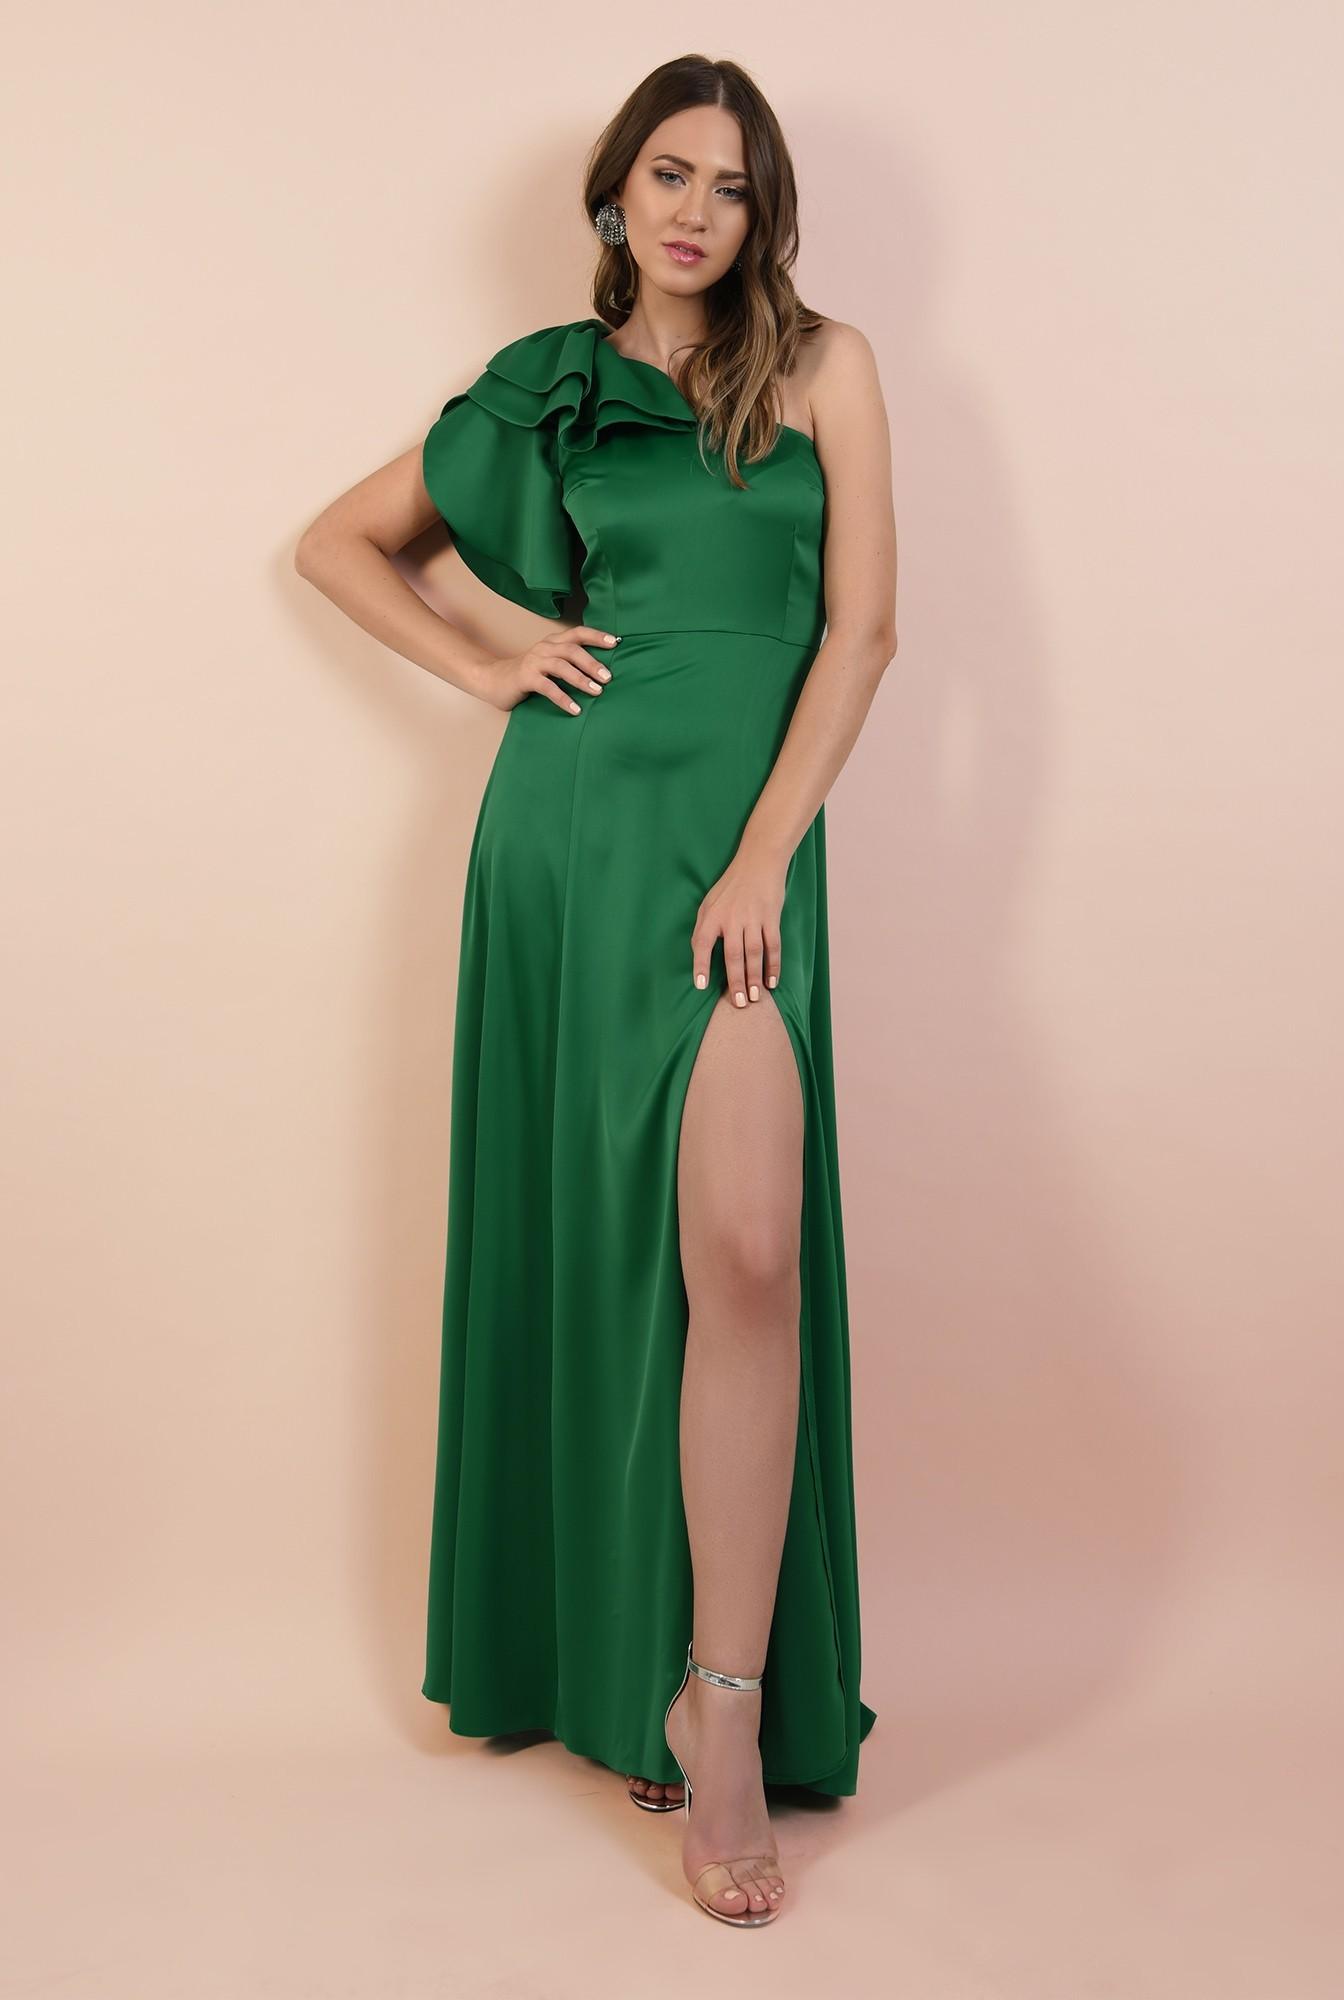 0 - rochie de ocazie, lunga, verde, cu crapeu, cu volane la umar, maneca lalea